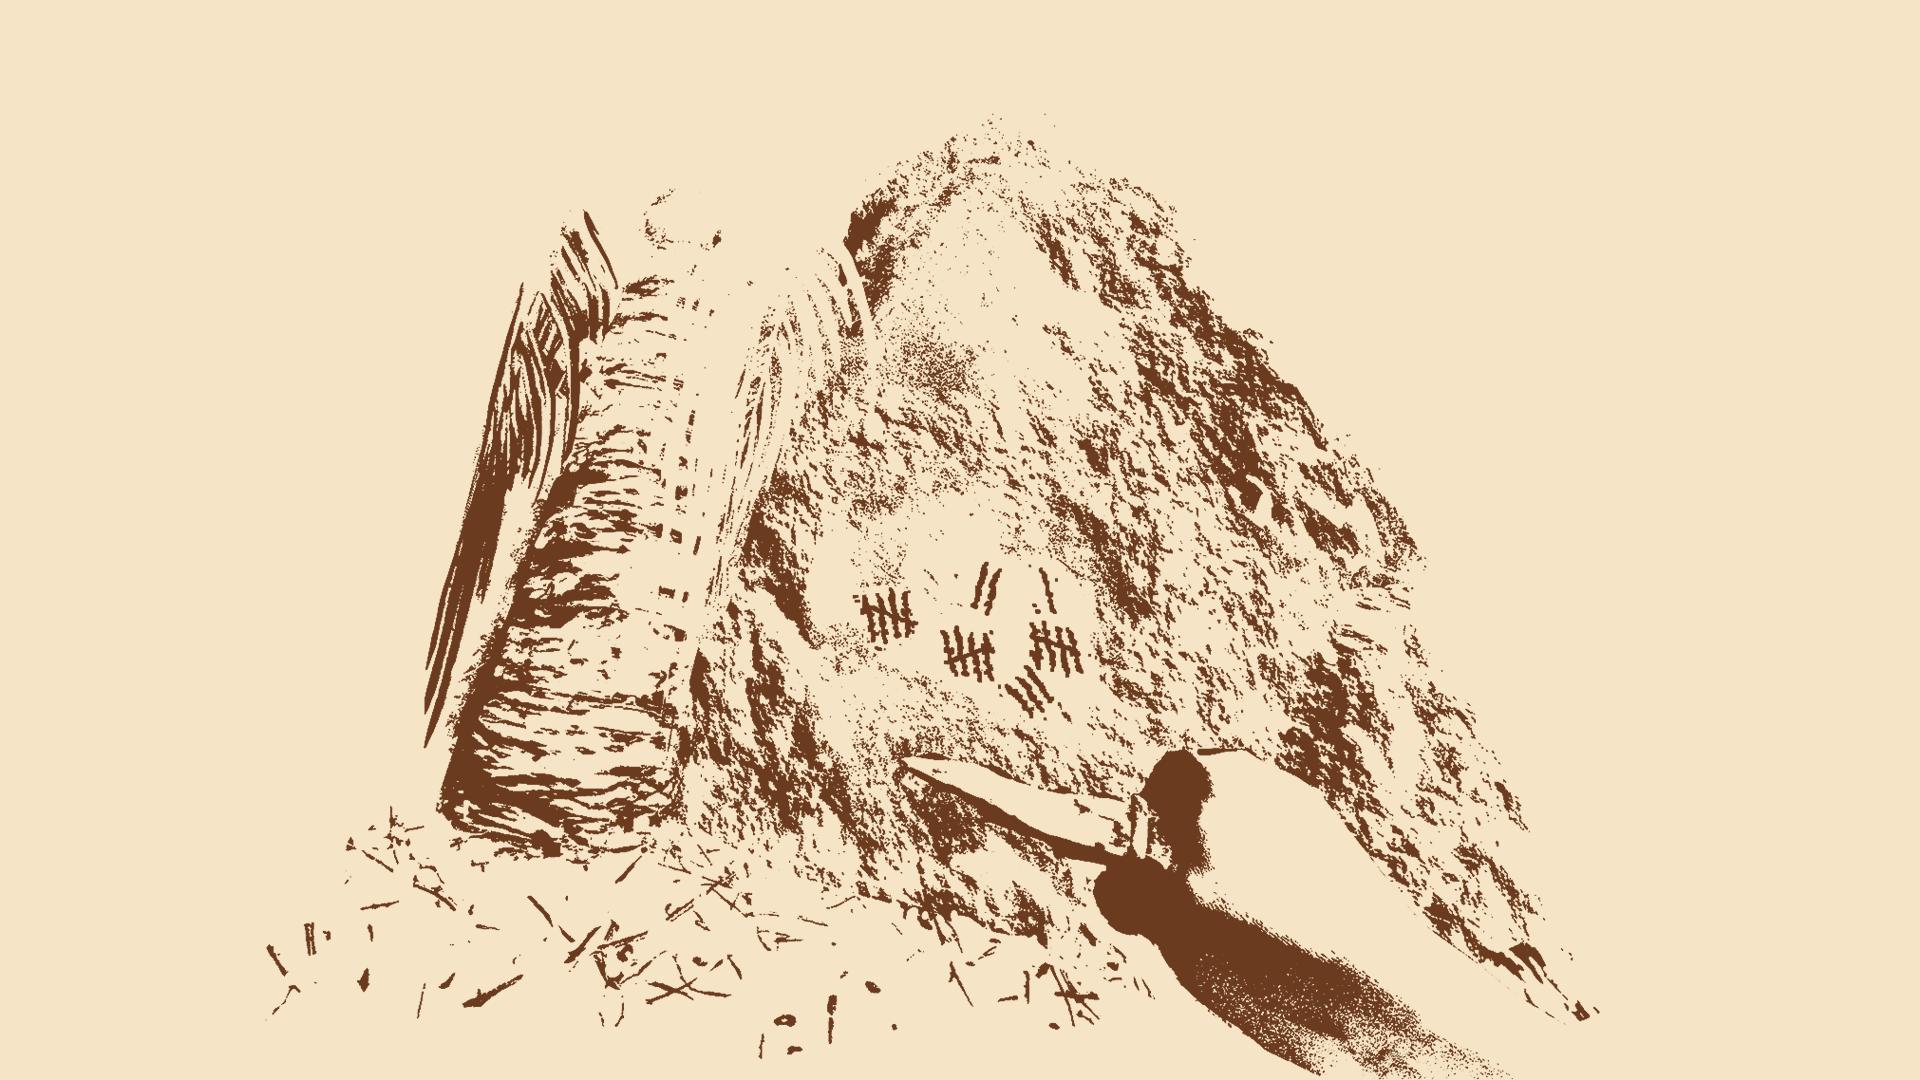 Island Hermit